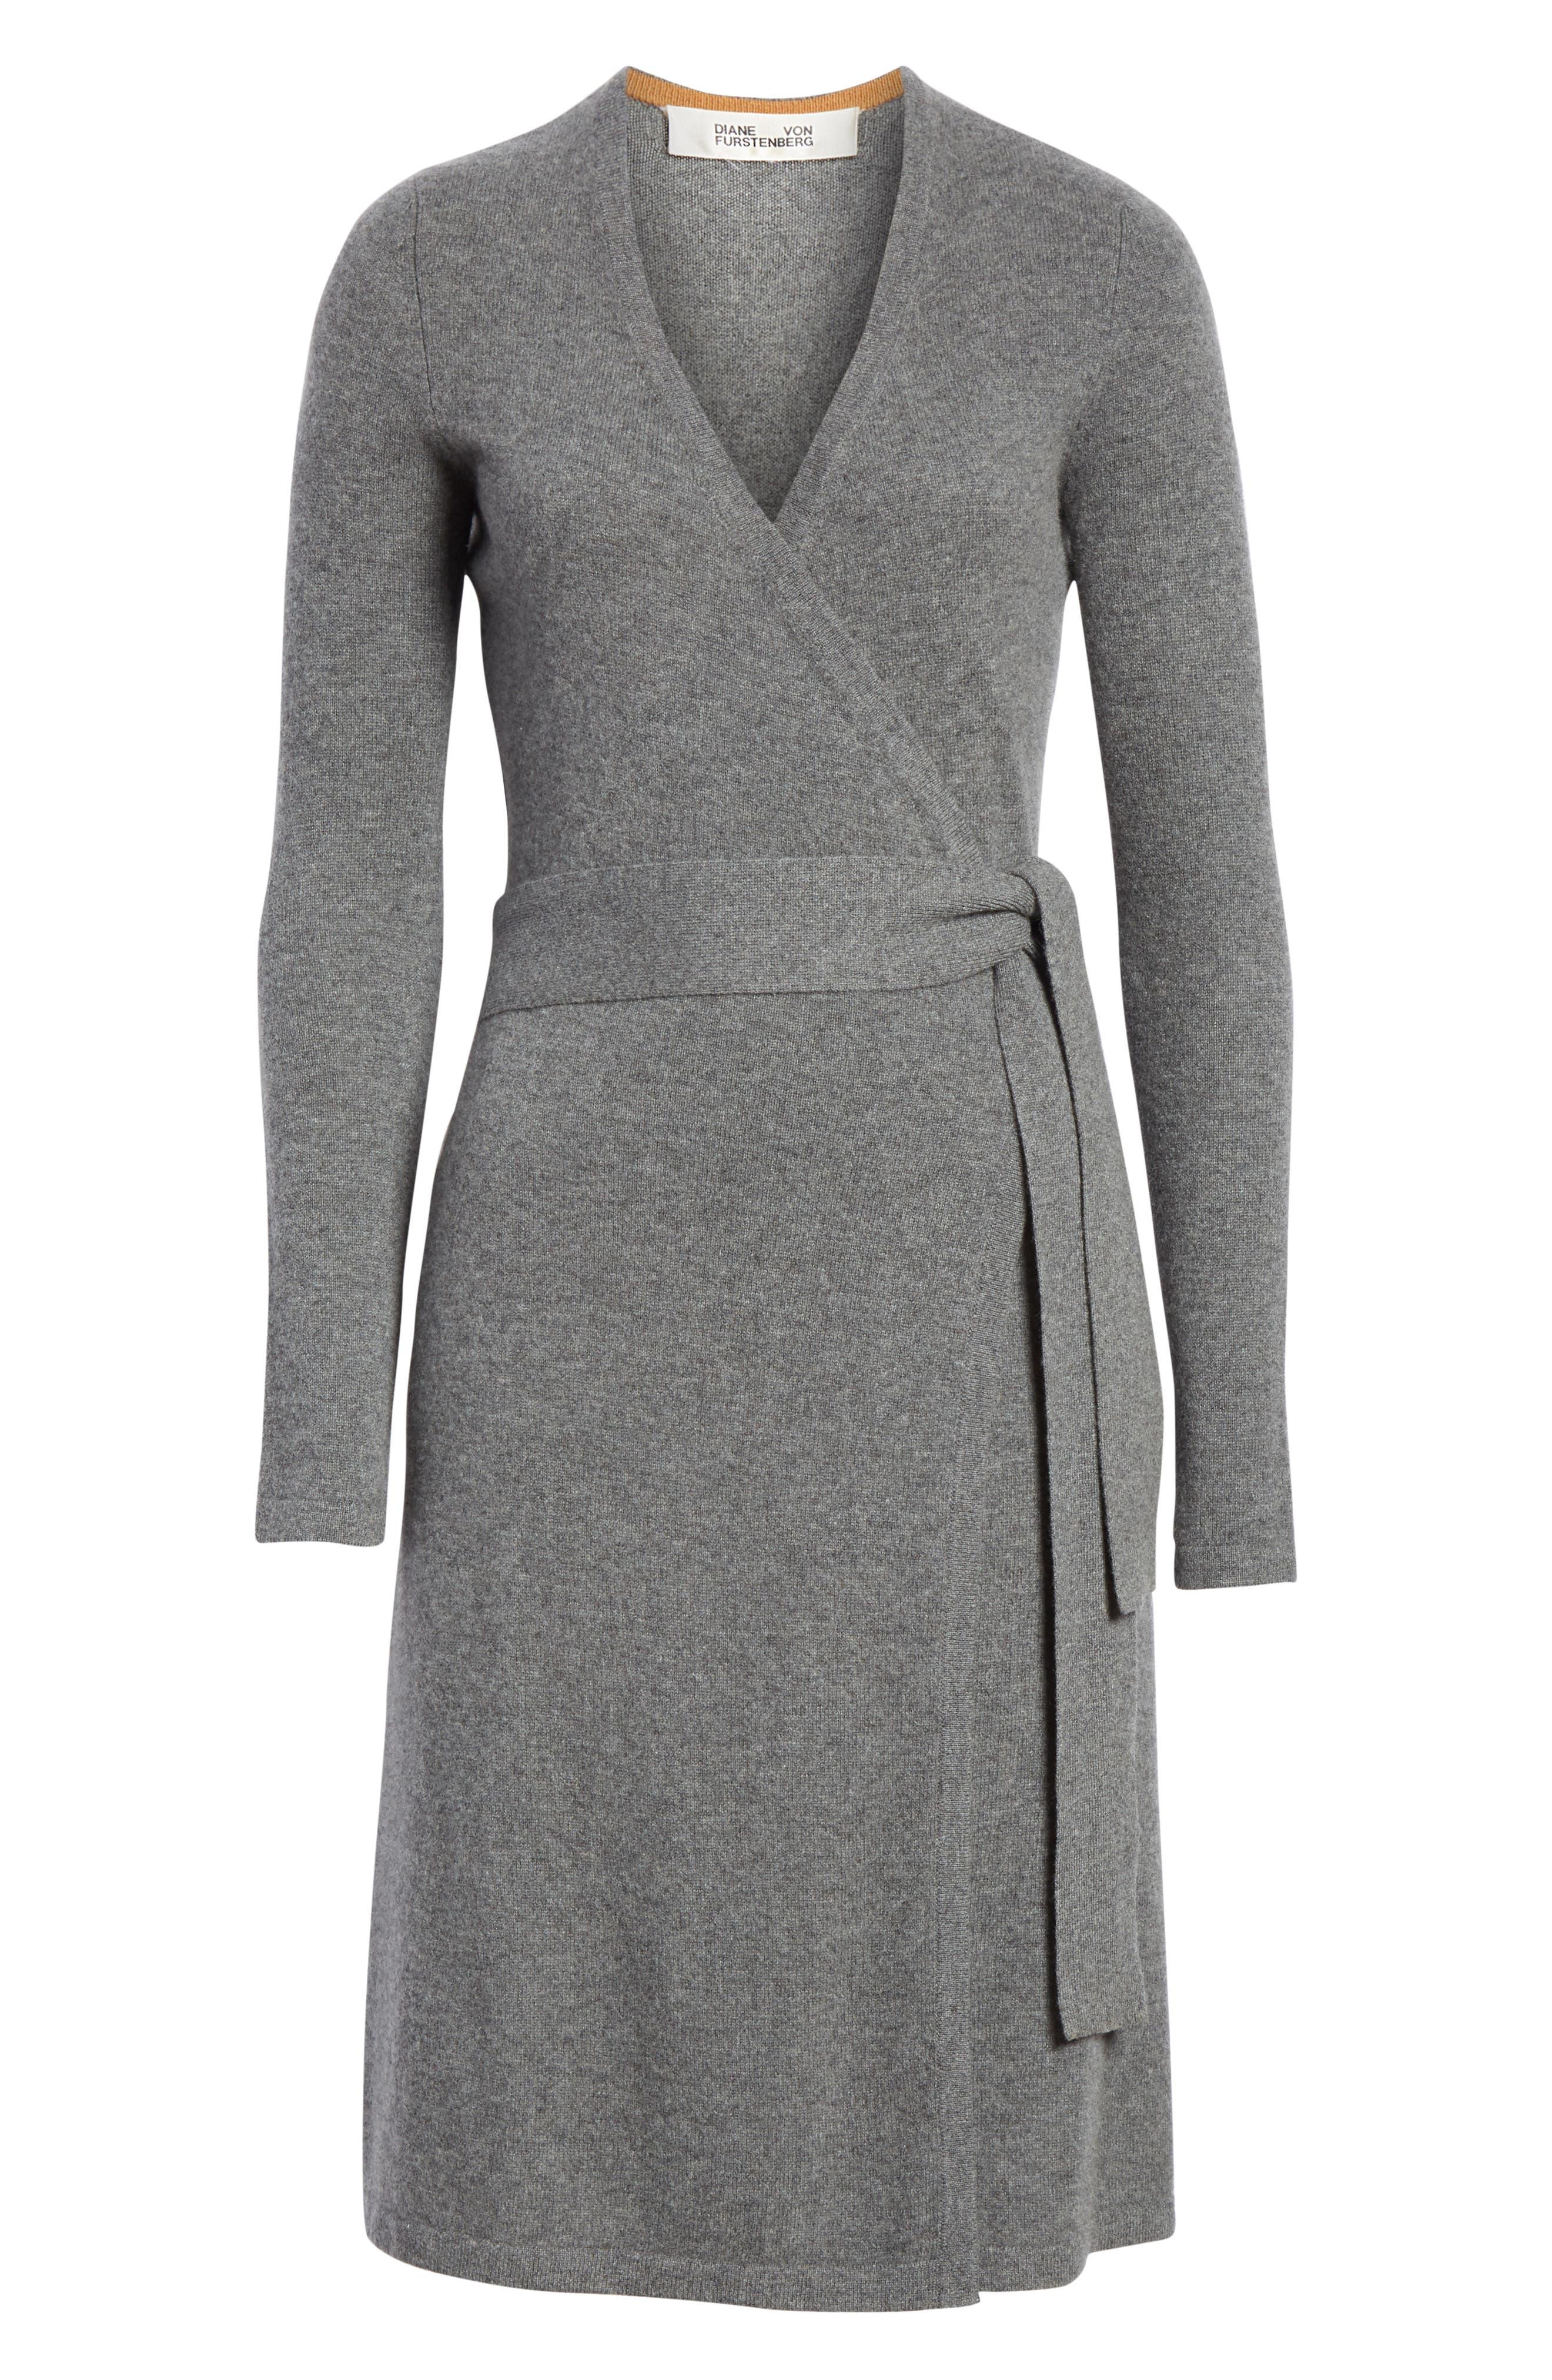 Diane Von Furstenberg Linda Cashmere Wrap Dress,                             Alternate thumbnail 11, color,